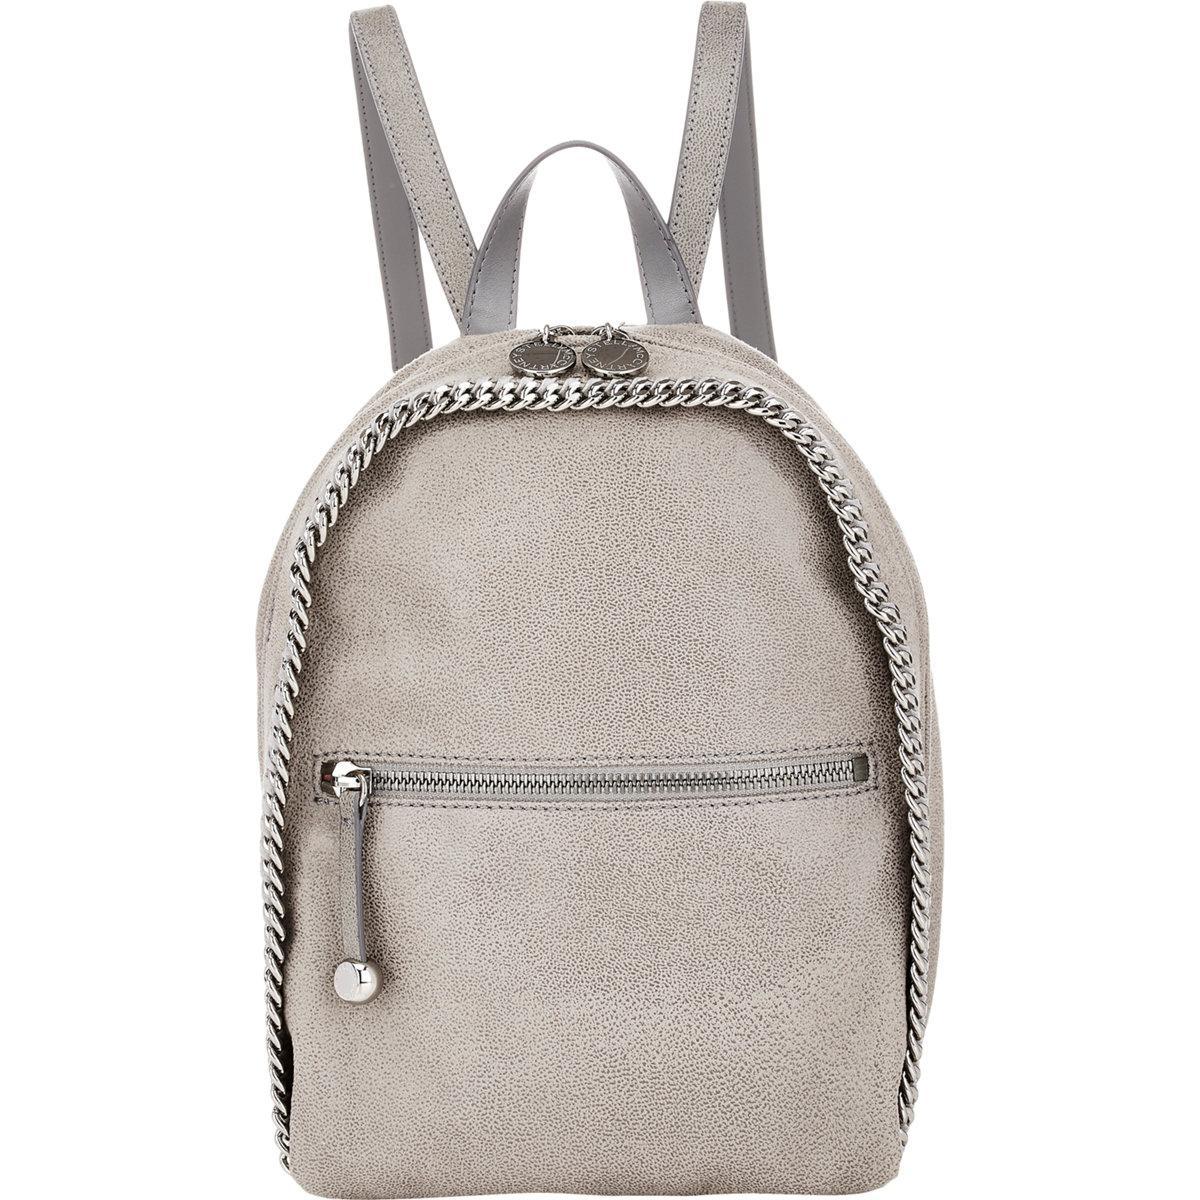 b7e92587f80e Lyst - Stella McCartney Falabella Shaggy Deer Mini-rucksack in Gray